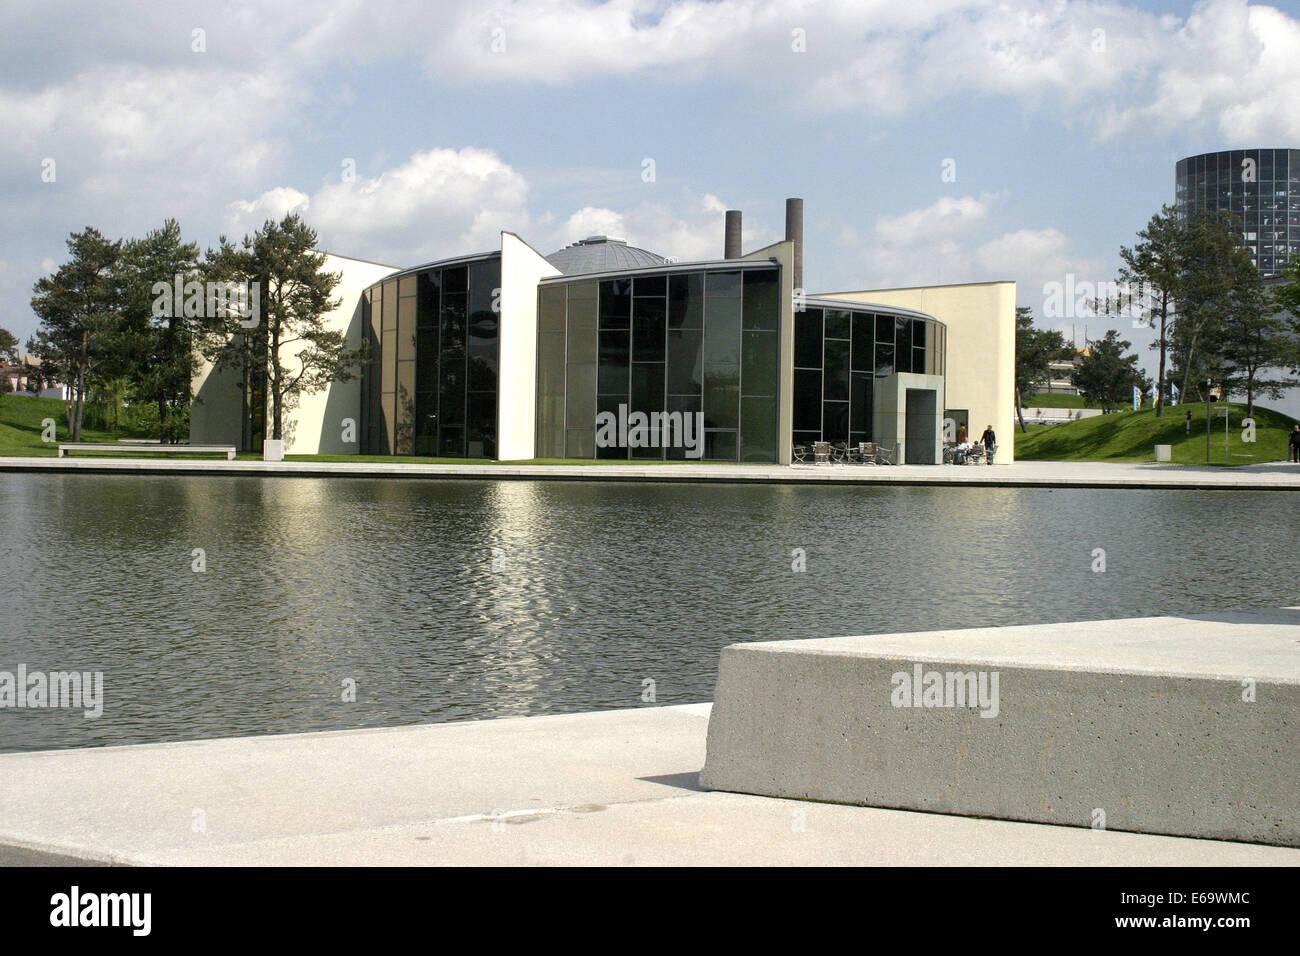 wolfsburg autostadt skoda pavillon stockfoto bild. Black Bedroom Furniture Sets. Home Design Ideas